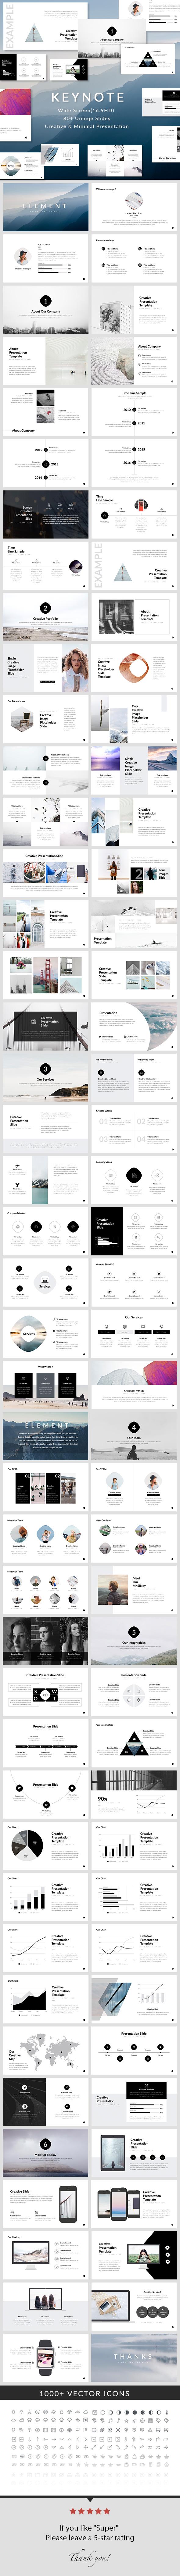 Element - Keynote Presentation Template - Creative Keynote Templates